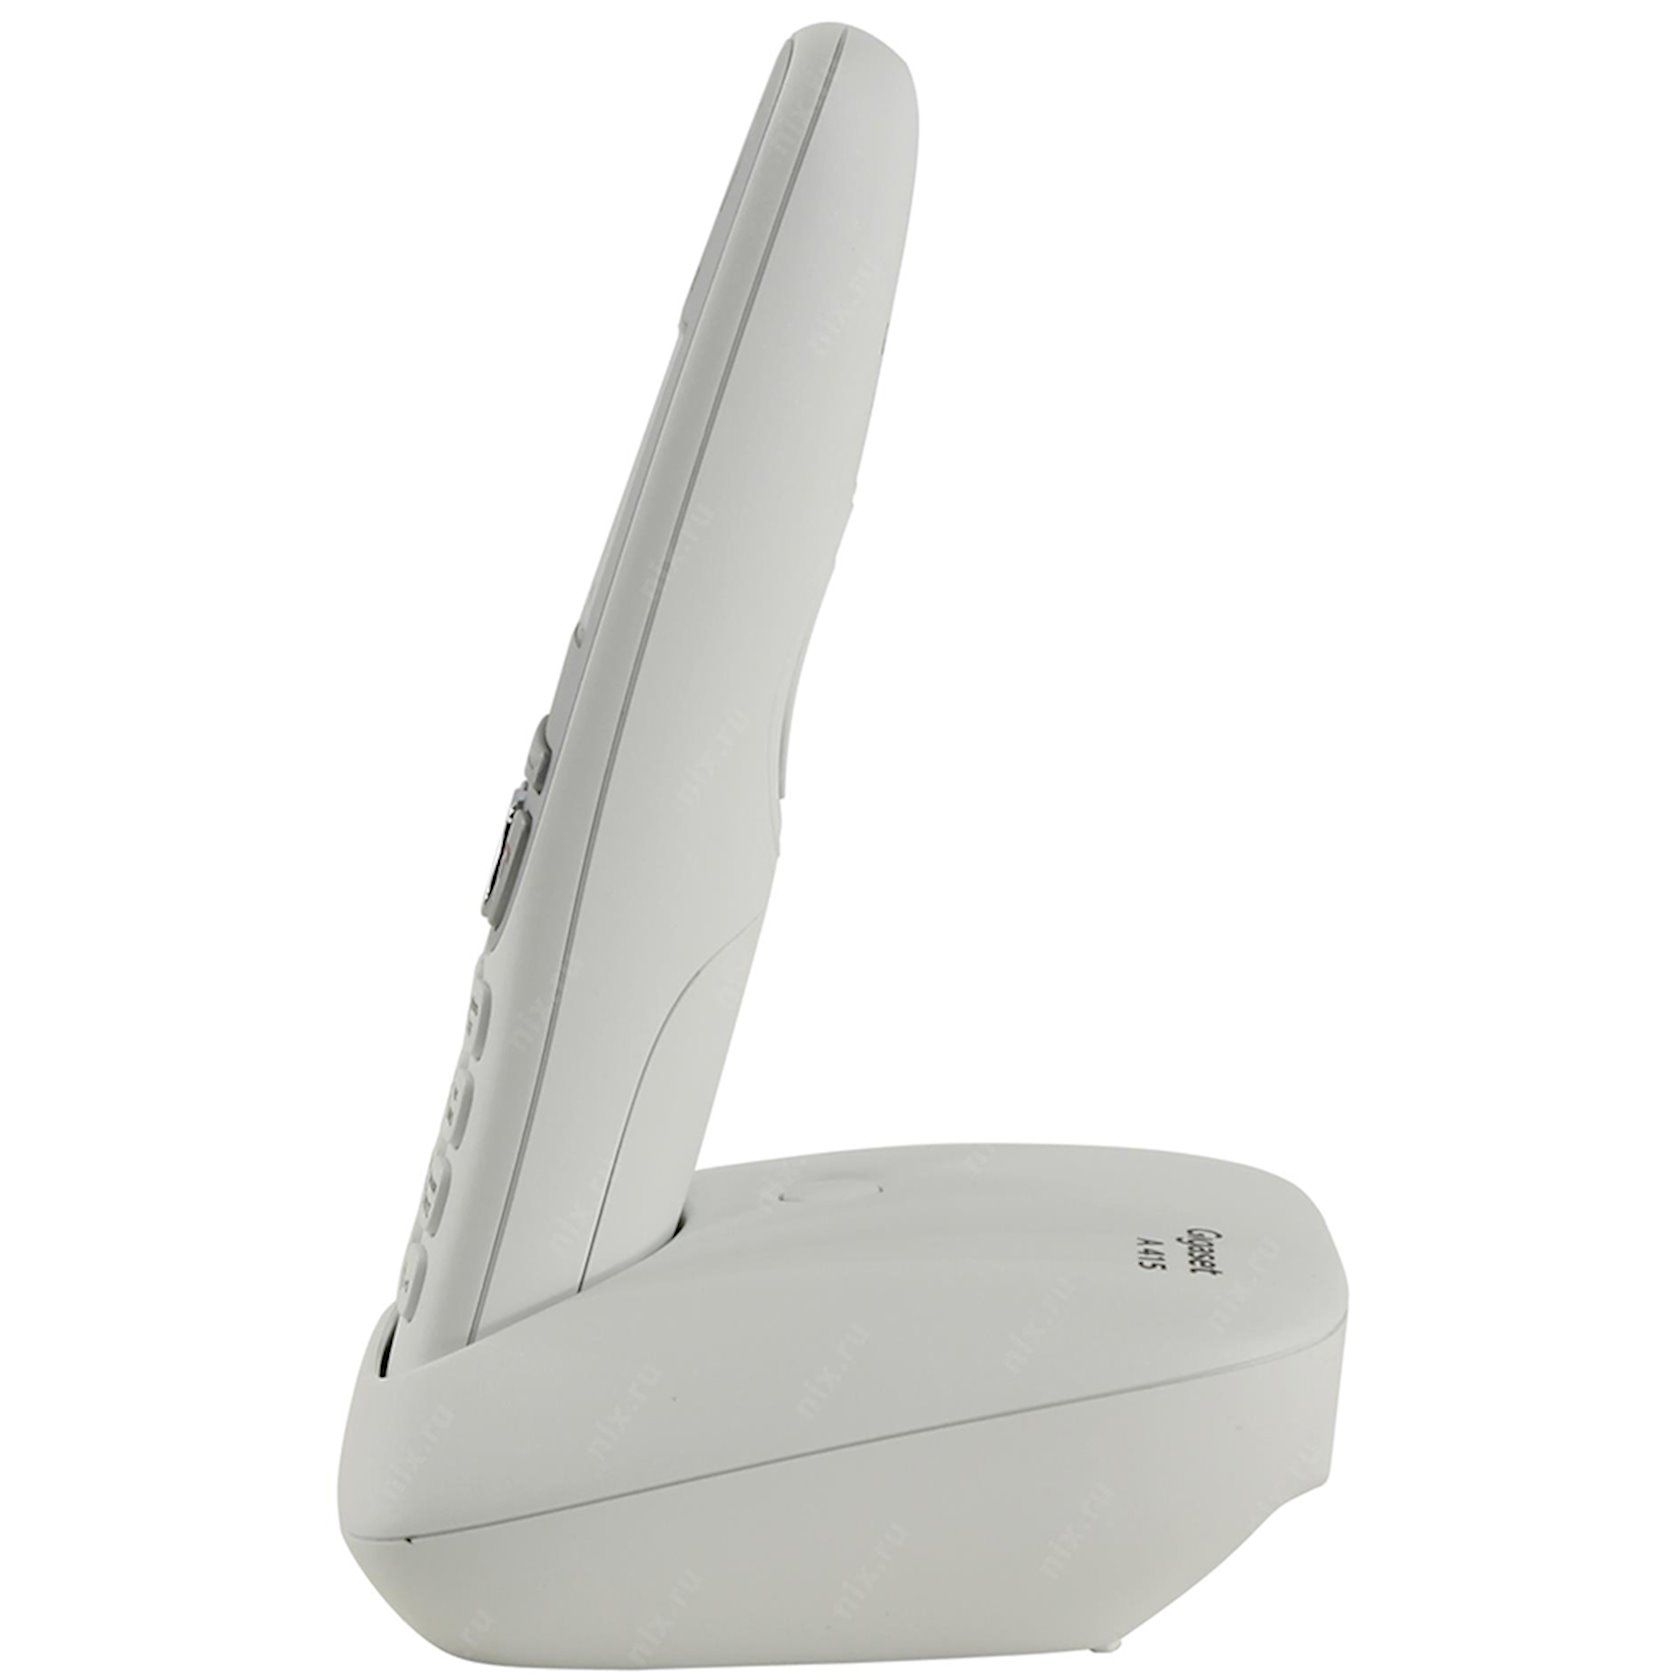 Radiotelefon Gigaset A415 White